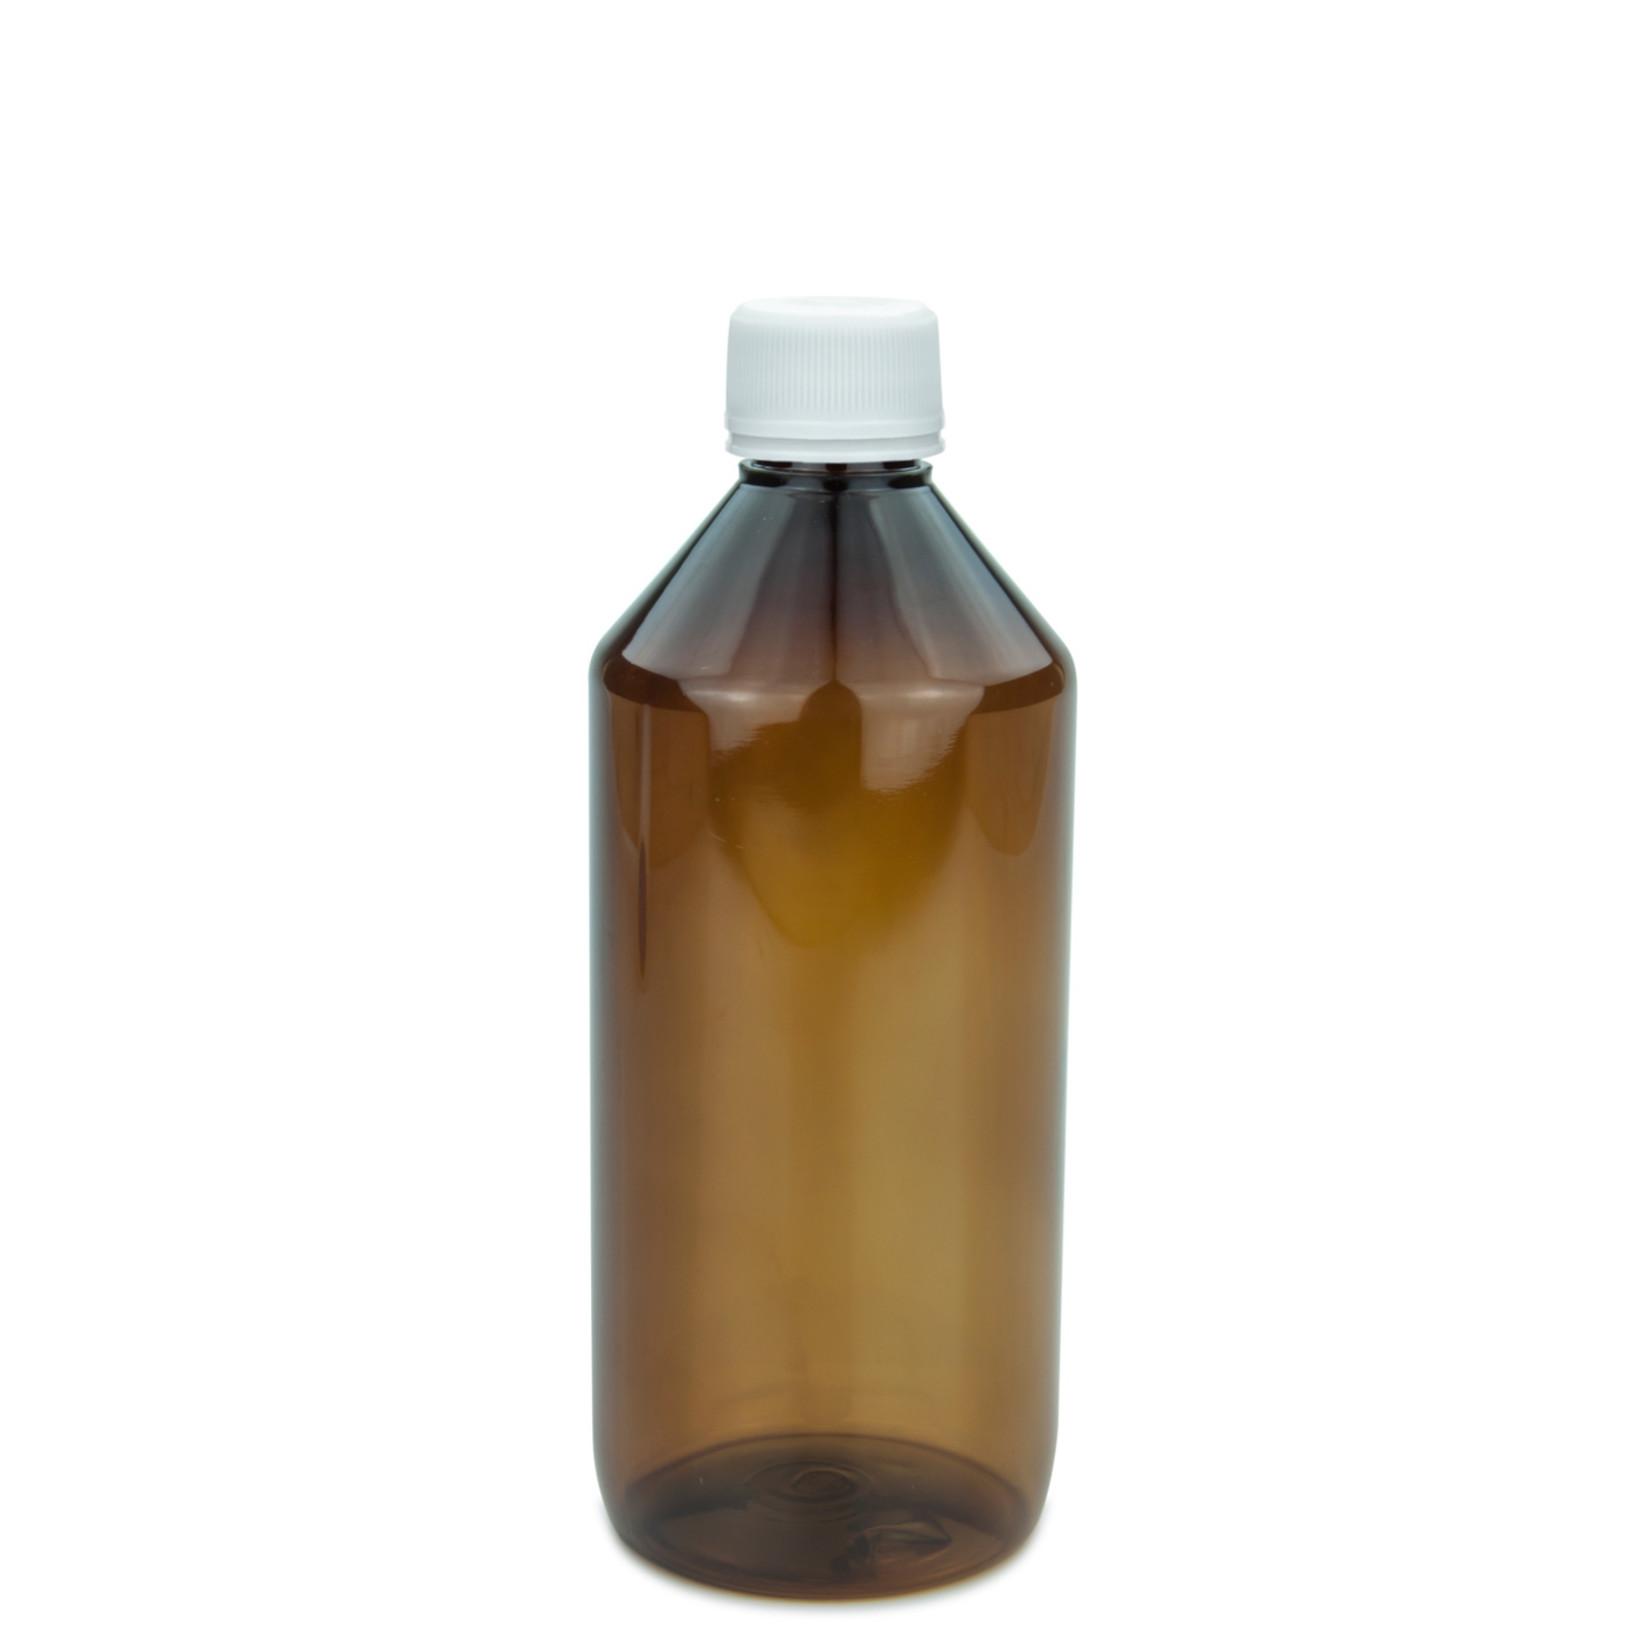 VPG 40/60 Nikotin-Salz Base 3-36 mg/ml 250-1000ml